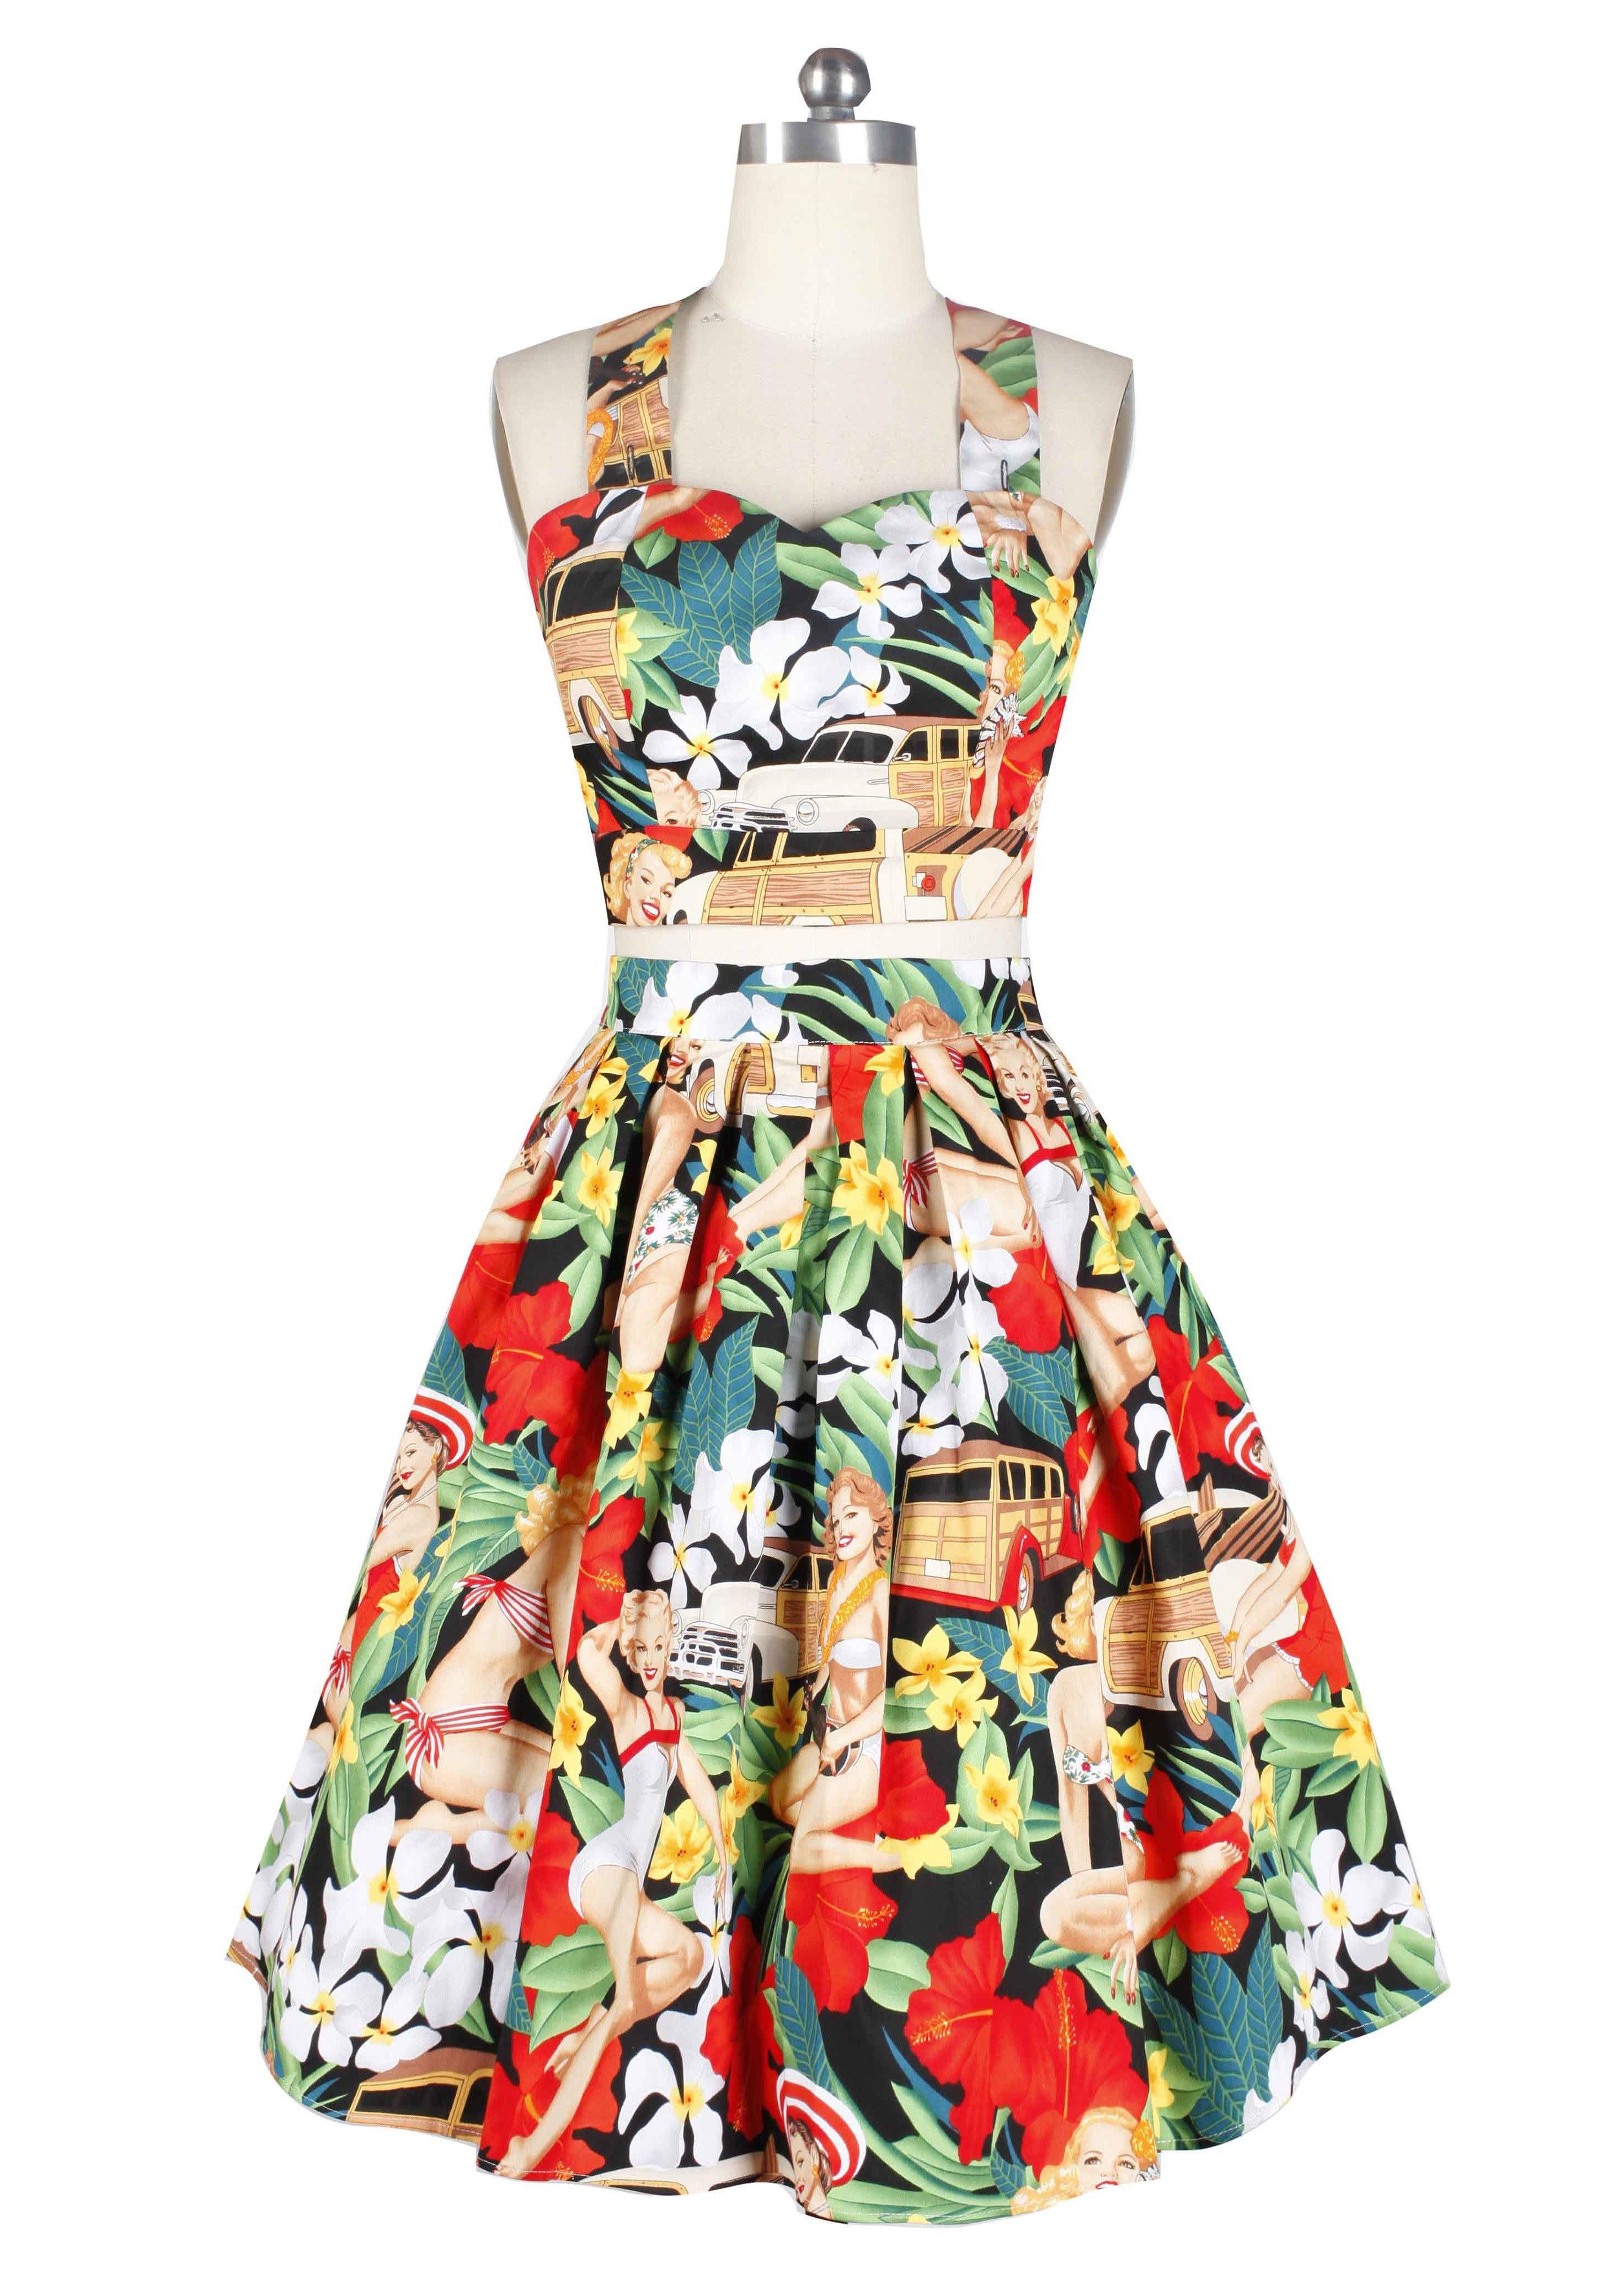 Pinup Girl Dresses